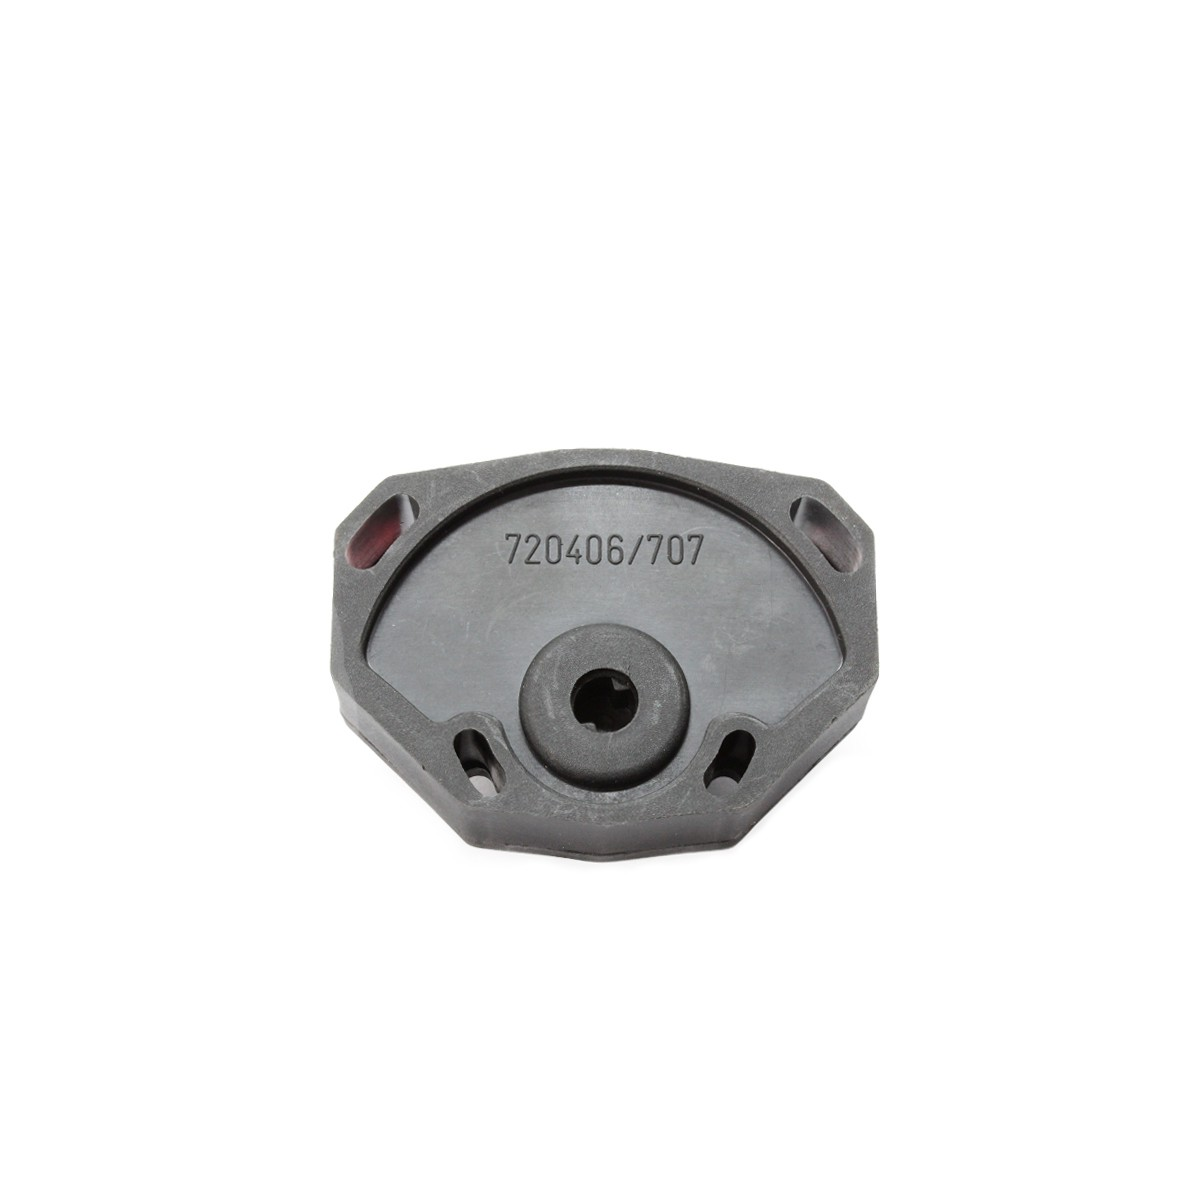 Sensor De Posição De Borboleta Fiat Tipo / Golf / Peugeot 106 / Renault